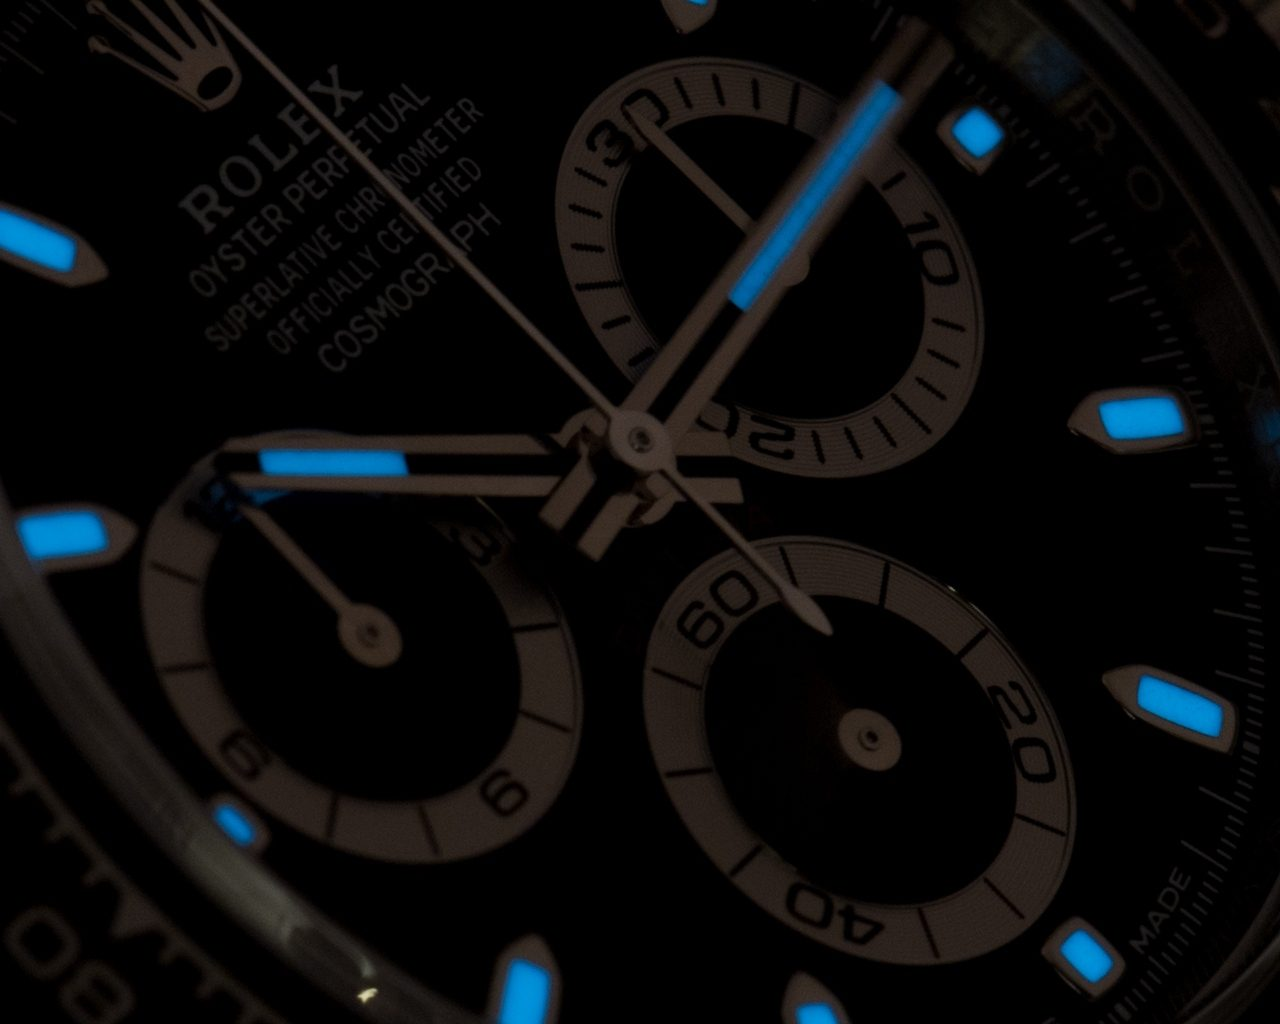 watch-test-rolex-daytona-116500ln-acciaio-con-lunetta-in-cerachrom-nera-prezzo-price_0-10024